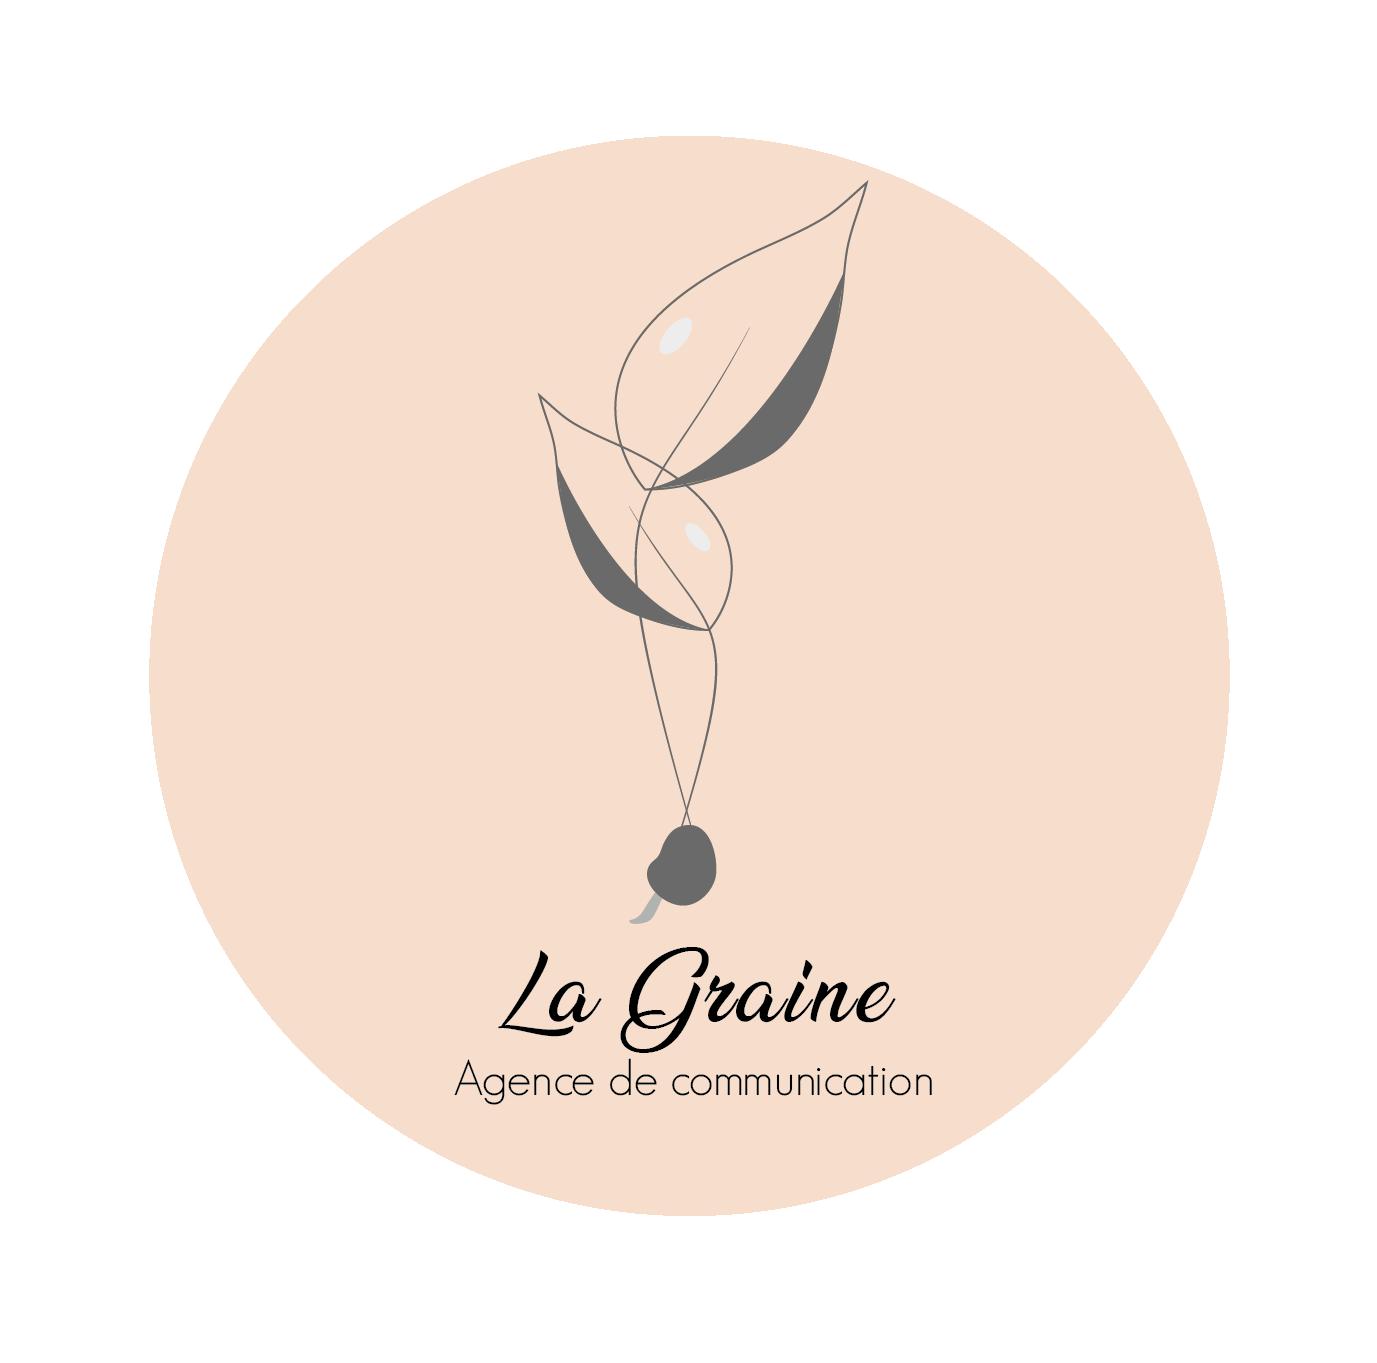 L'Agence La Graine